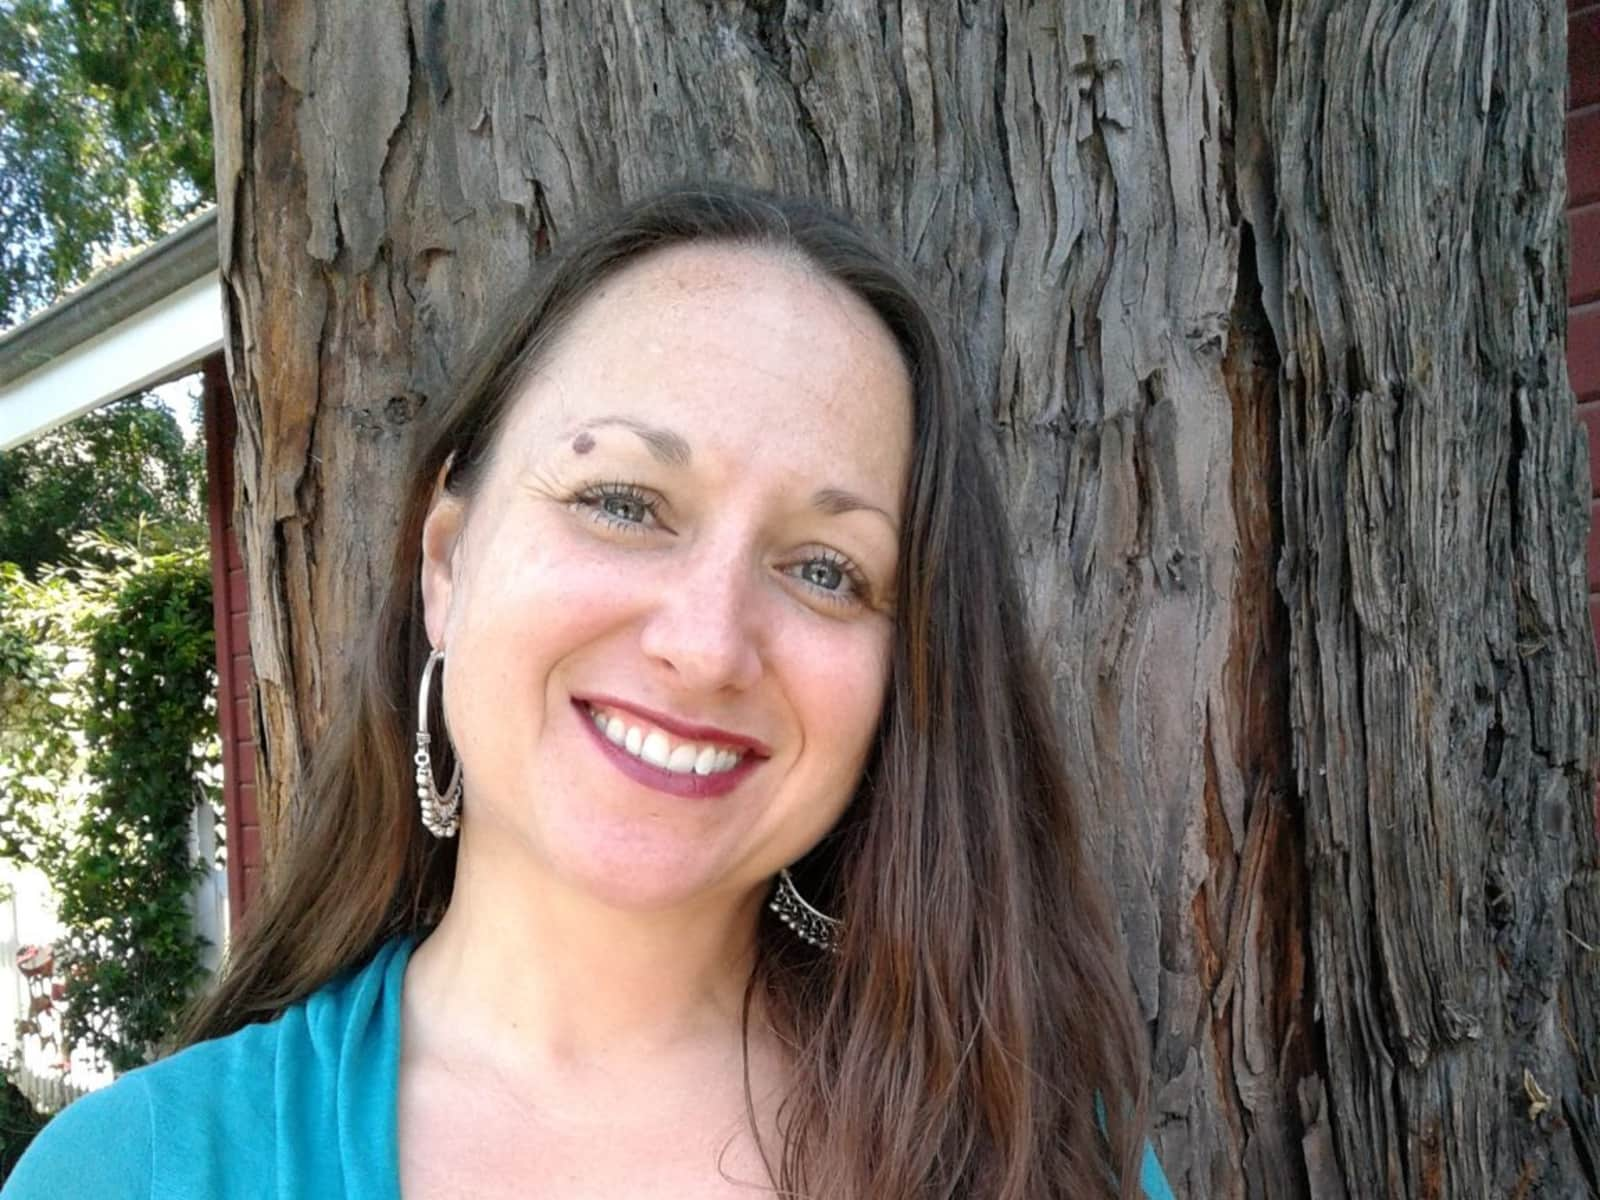 Heather from Santa Cruz, California, United States